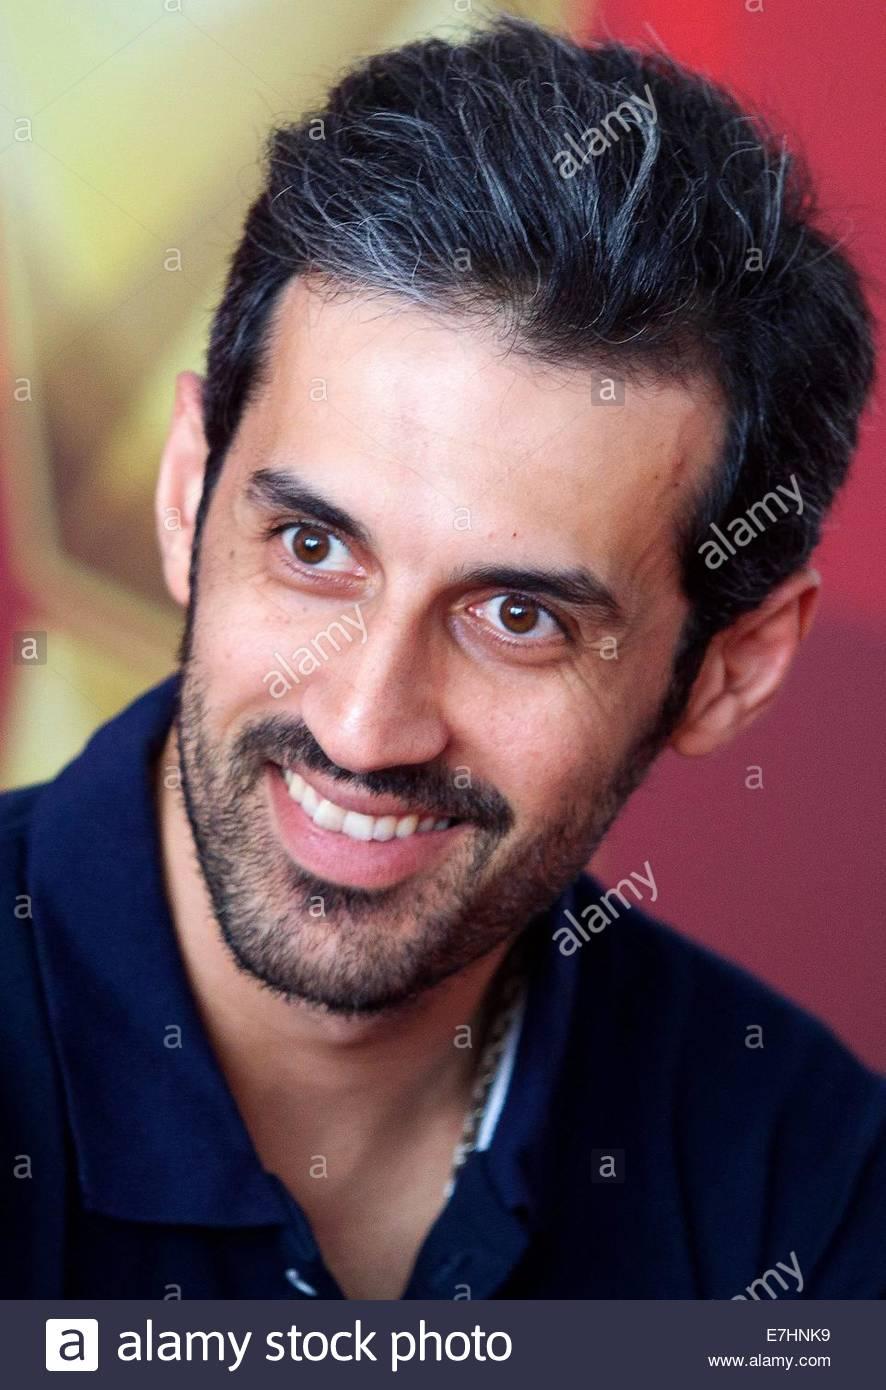 http://c8.alamy.com/comp/E7HNK9/epa04401909-irans-team-captain-mir-saeid-marouflakrani-smiles-during-E7HNK9.jpg